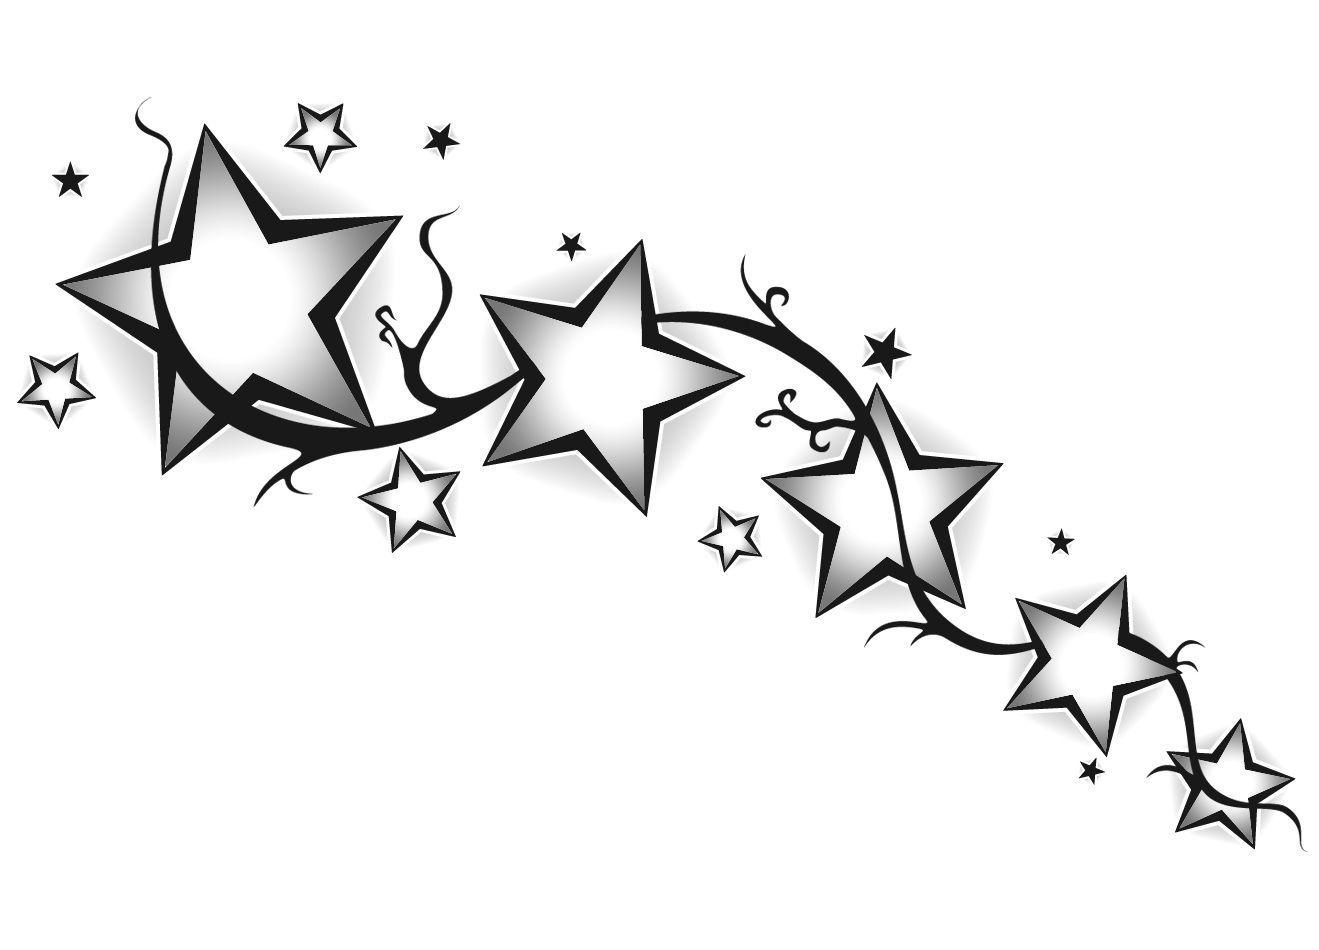 Star Tattoo Designs. Star Tattoo Designs   Star tattoo designs  Tattoo designs and Tattoo